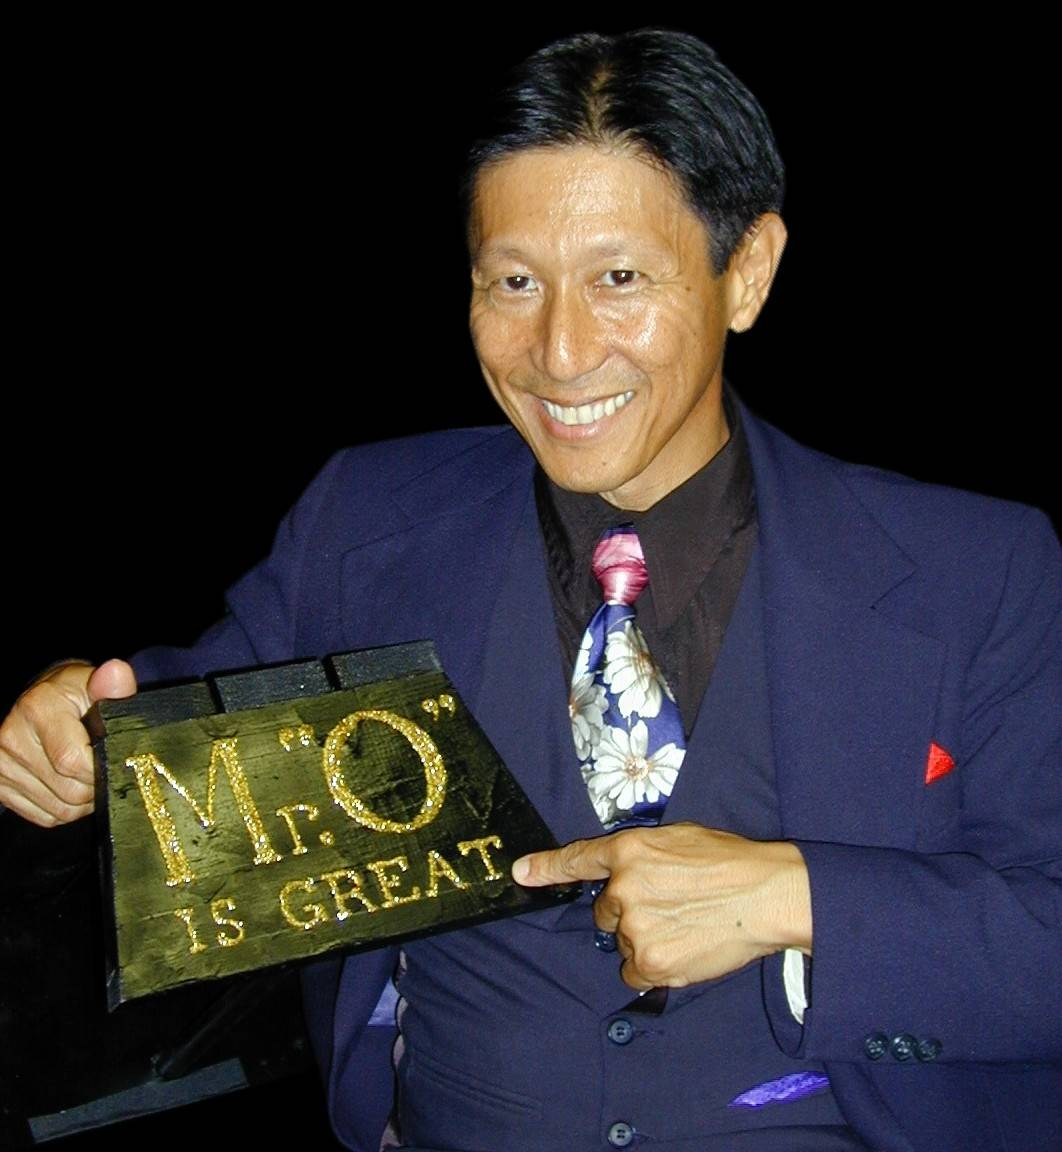 Mr. O